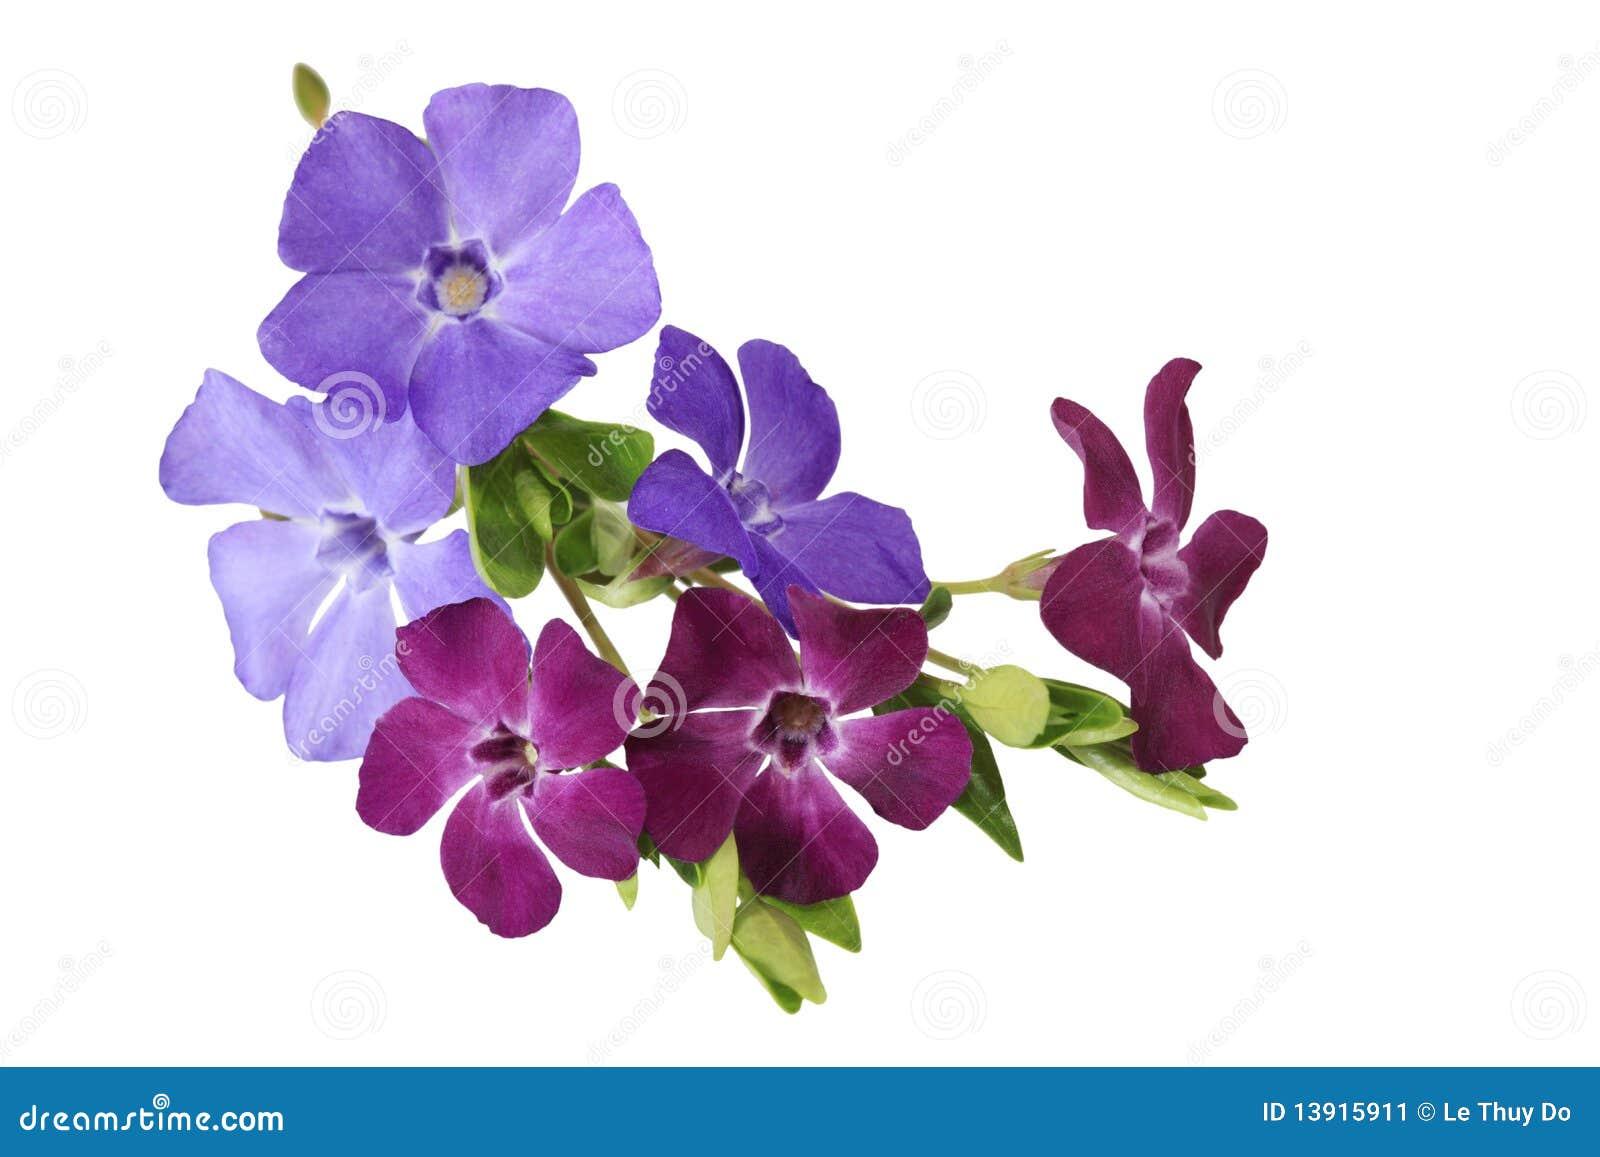 Myrtle Vinca Flowers